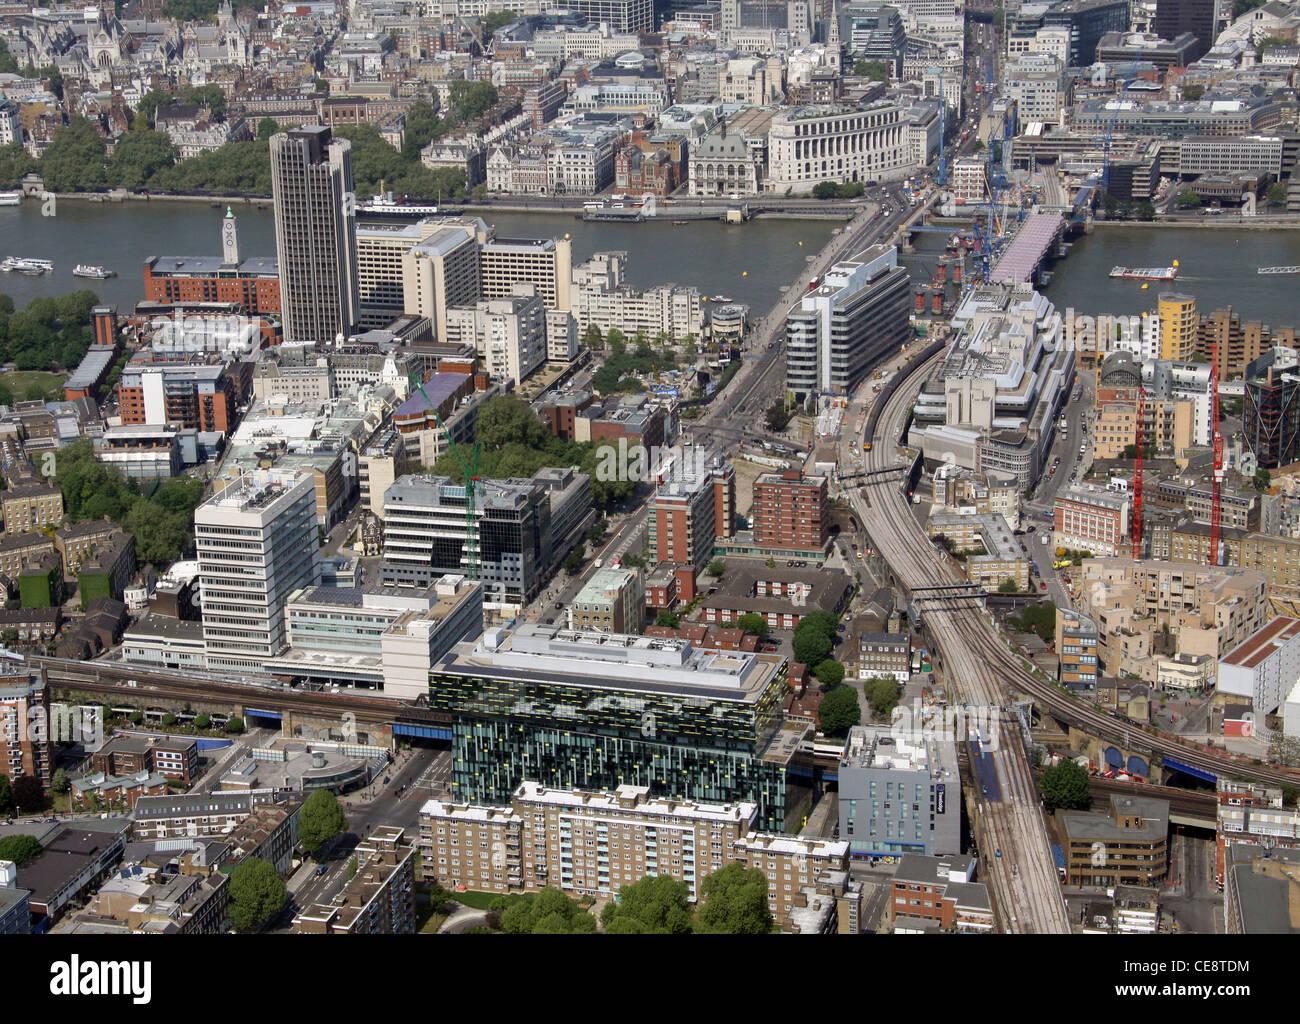 Aerial image of Blackfriars Road and Blackfriars Bridge, London SE1 - Stock Image